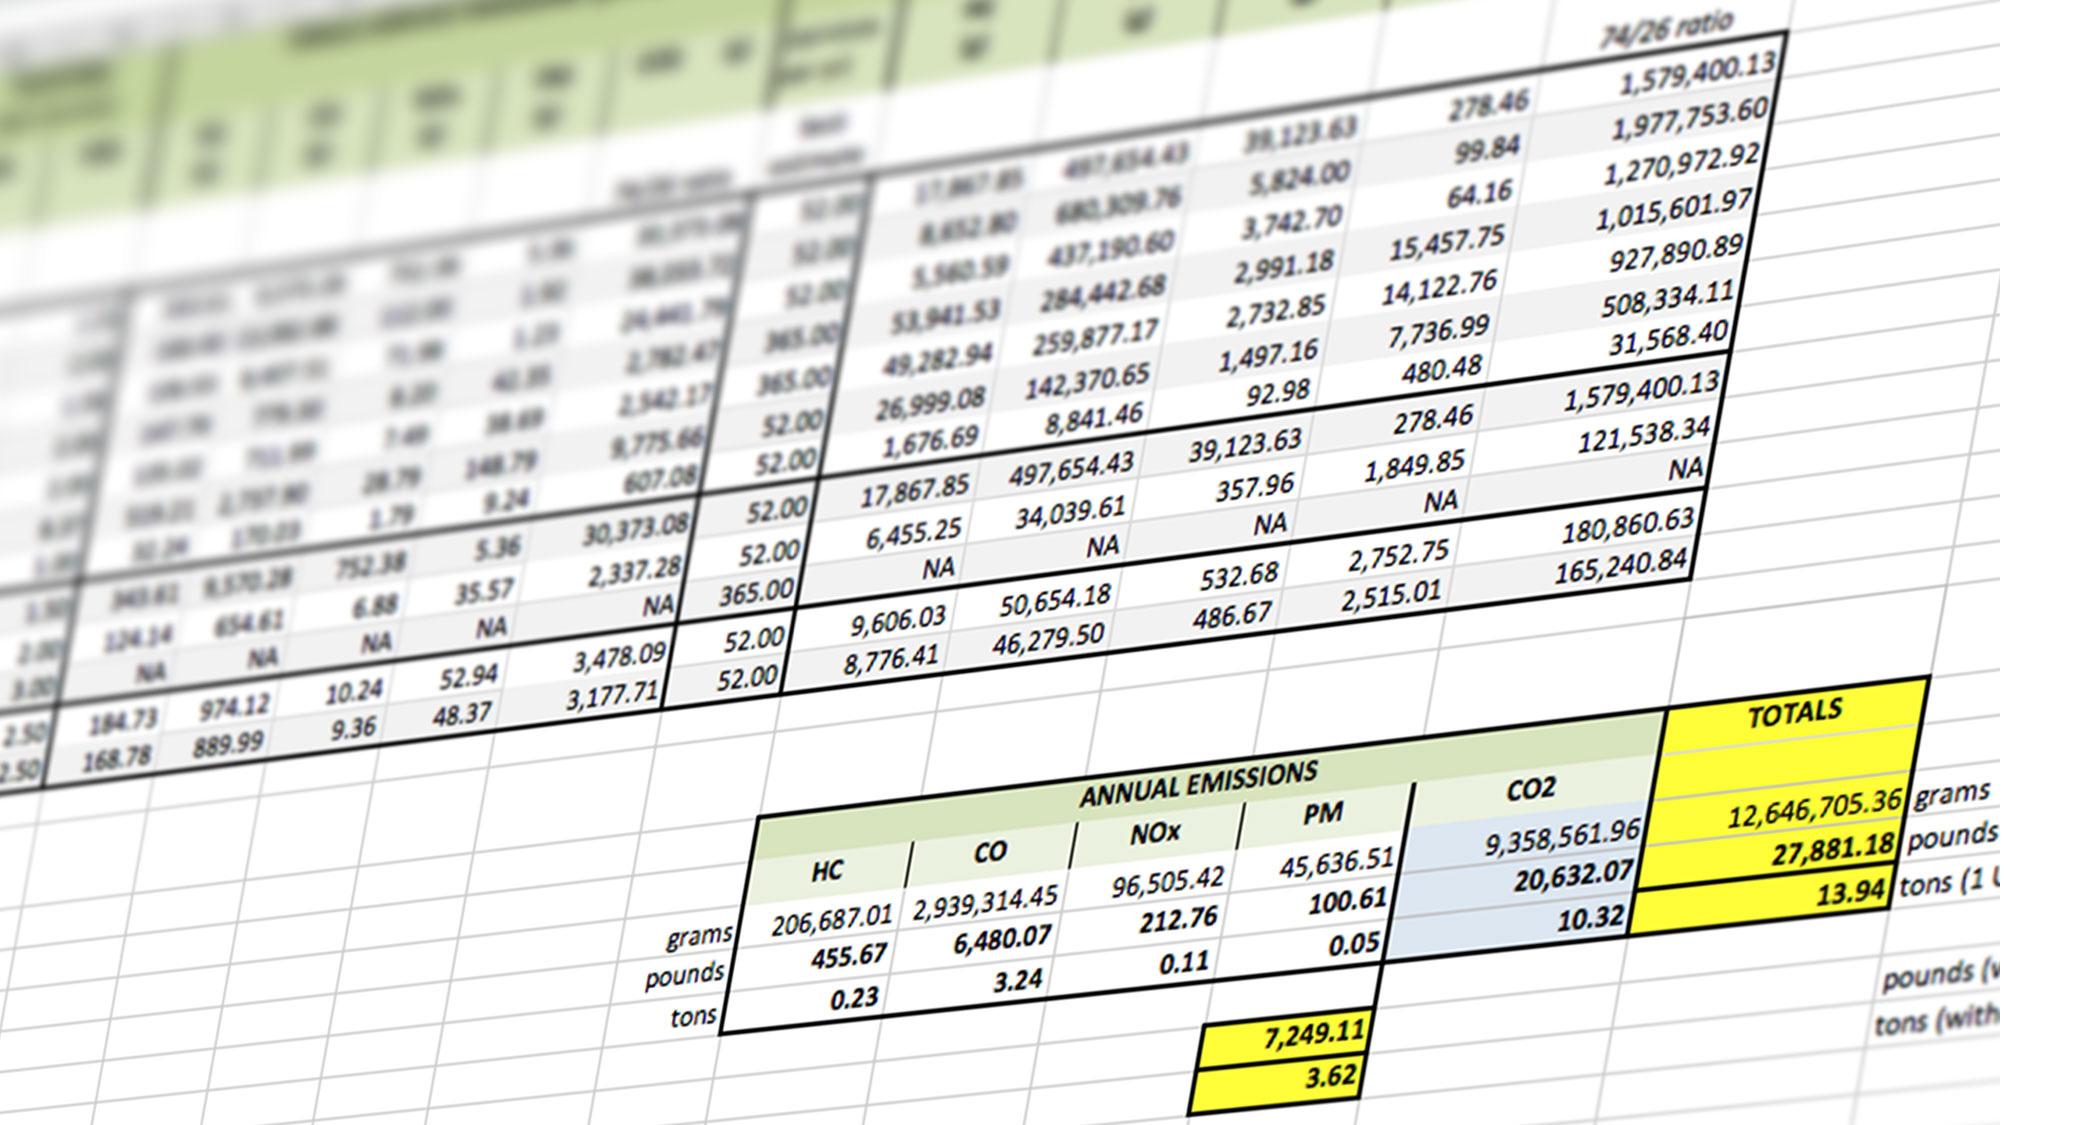 AGZA_GZ_ASGC_data_tables_2000_margin.jpg